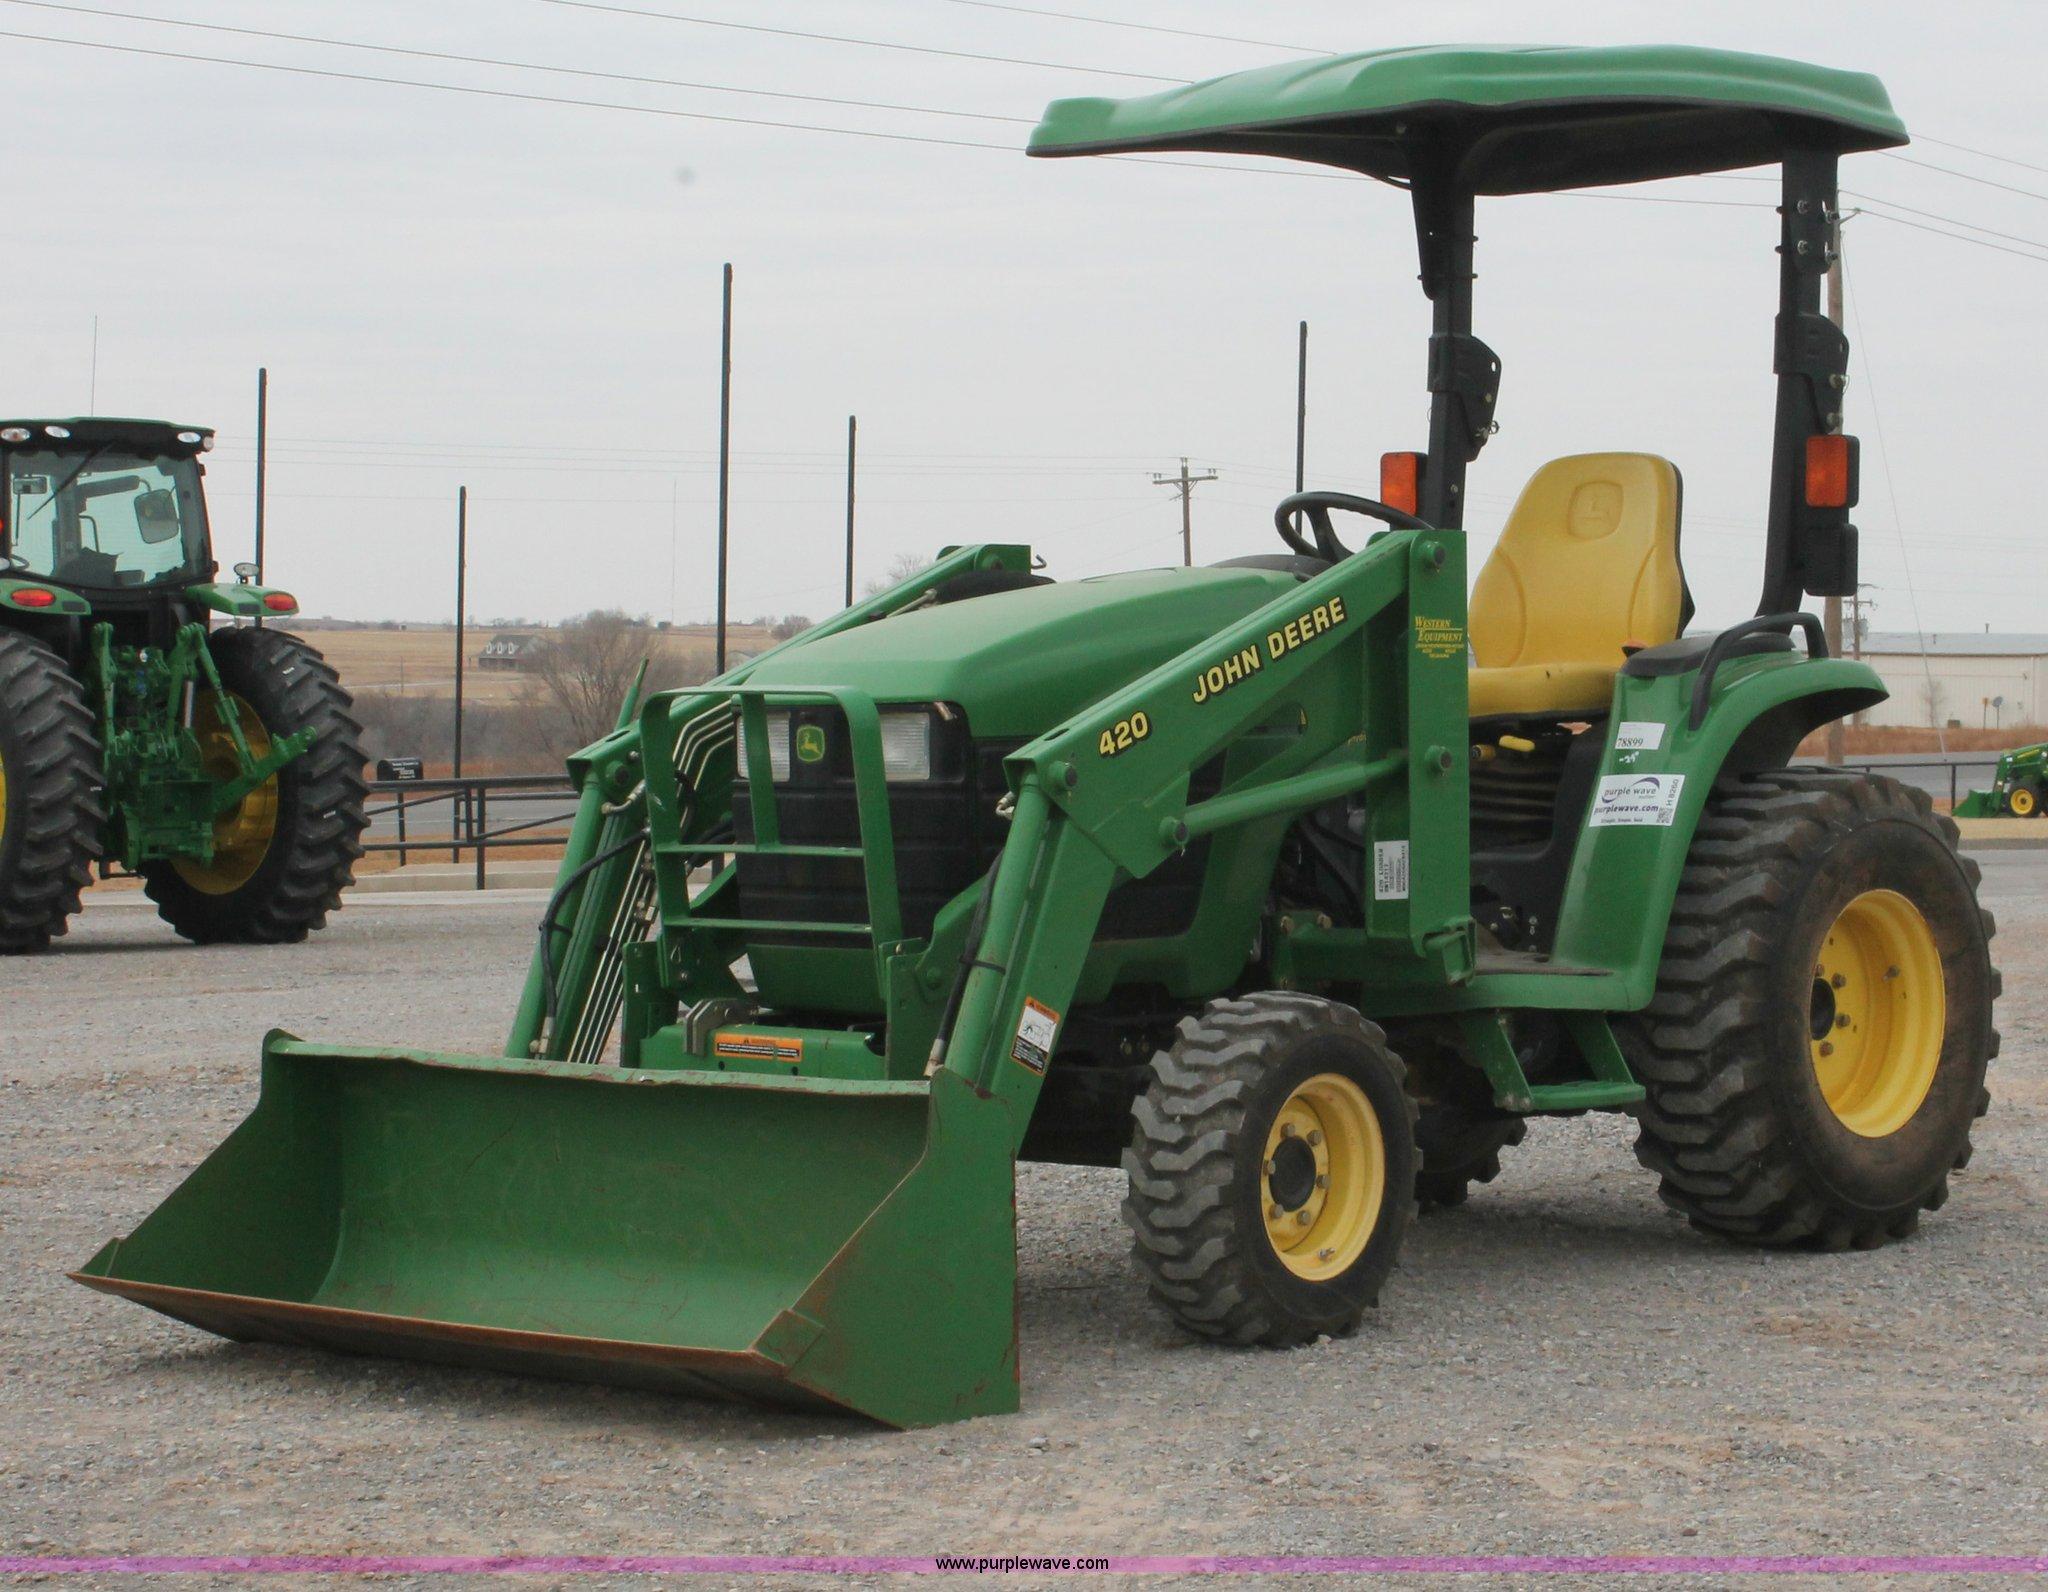 2004 John Deere 4210 Mfwd Tractor Item H8260 Sold M. Full Size In New Window. John Deere. John Deere 420 Pto Diagram At Scoala.co